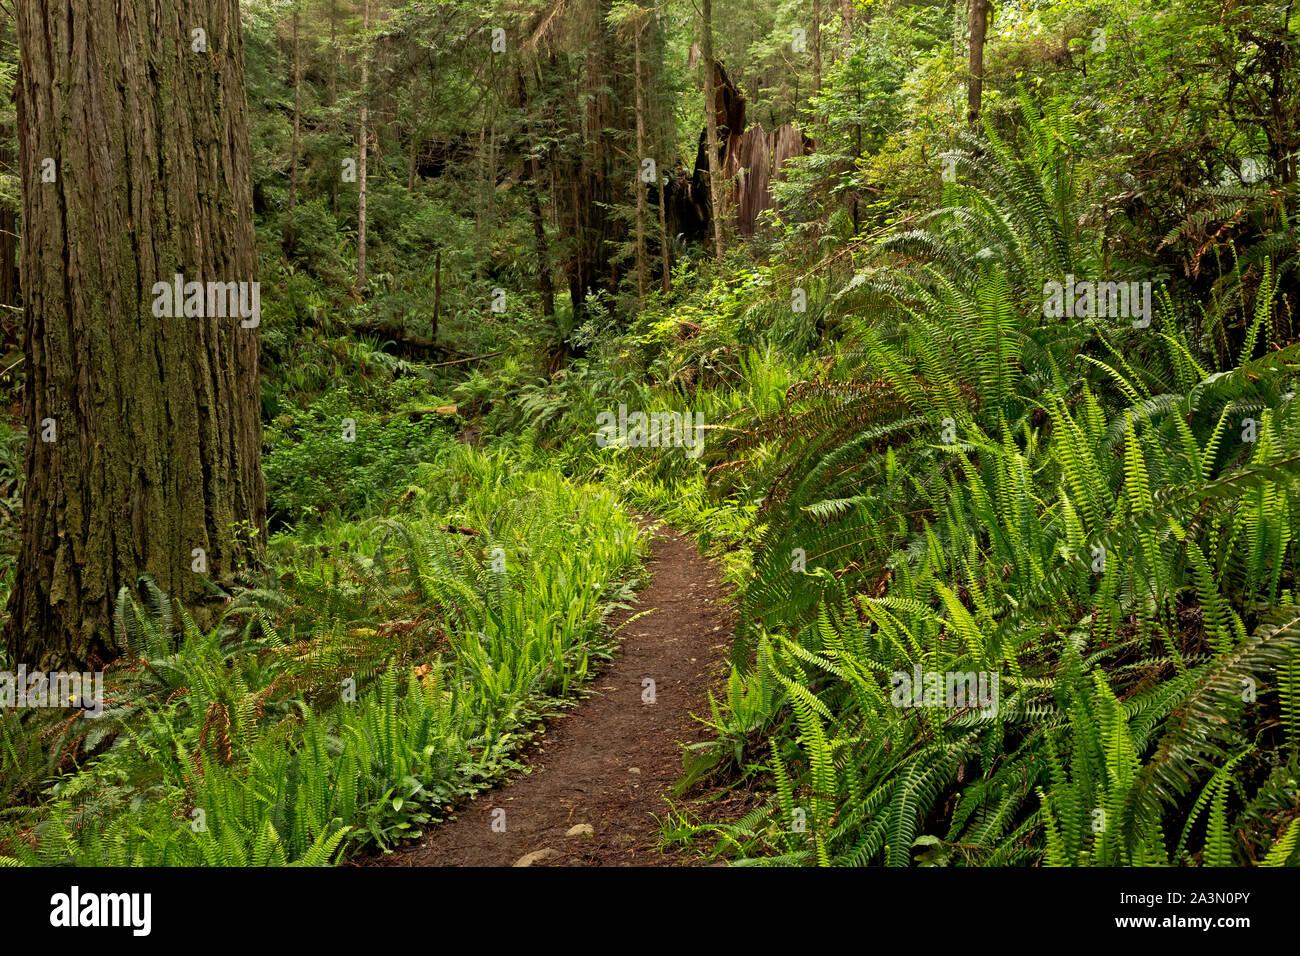 CA03644-00...CALIFORNIA - Ferns lining the Miner's Ridge Trail in Prairie Creek Redwoods State Park. Stock Photo